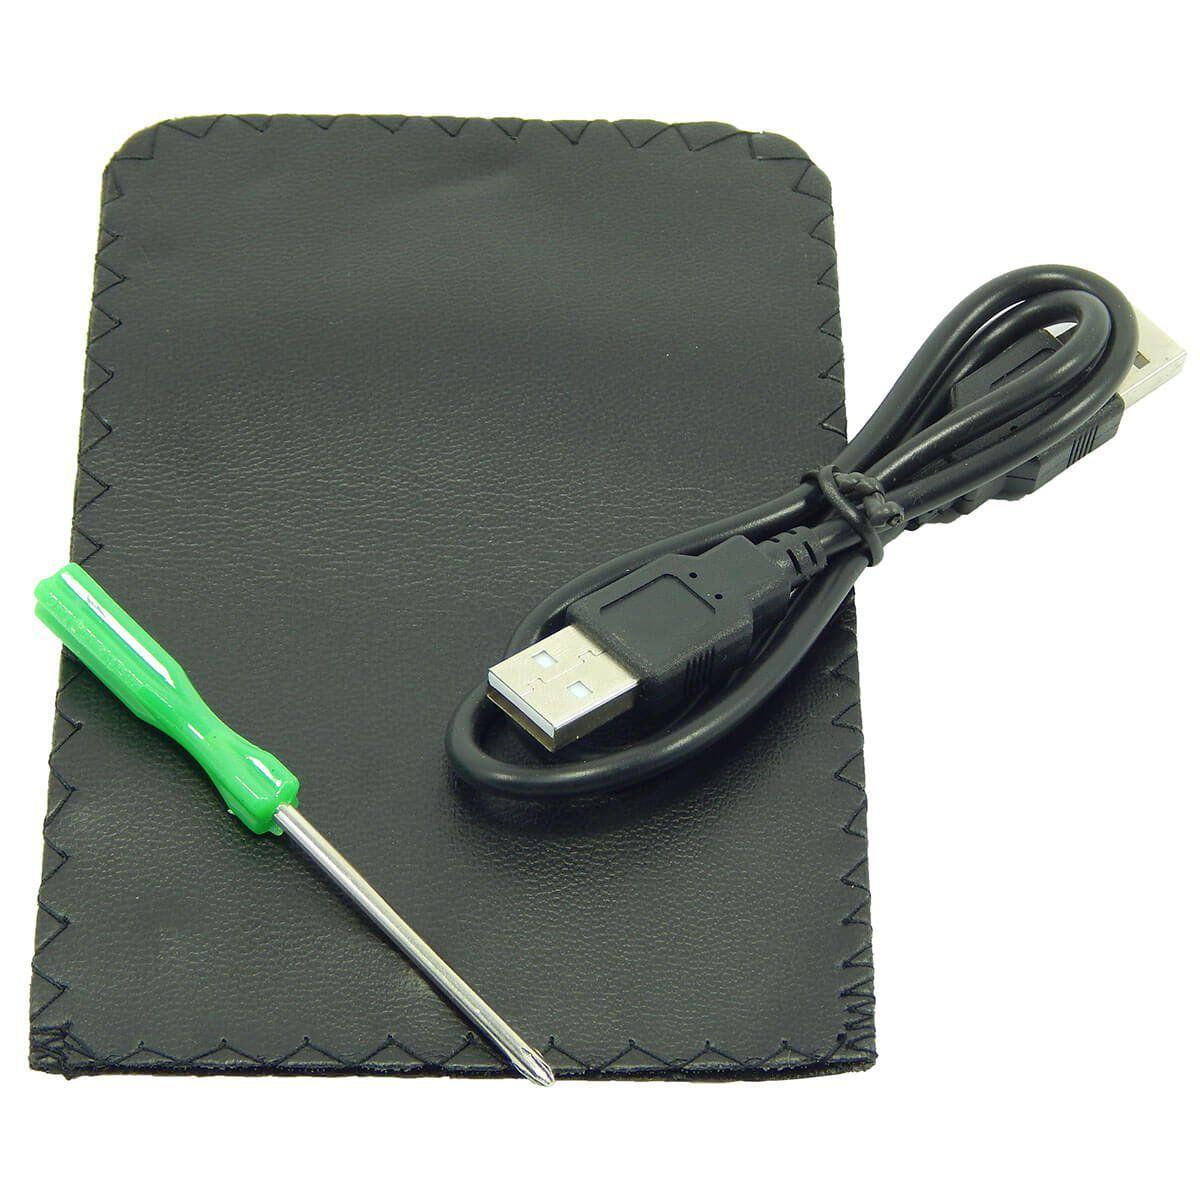 "Case USB 2.0 para HD Sata de 2,5"" (HD de Notebook) em Alumínio Exbom CGHD-10"